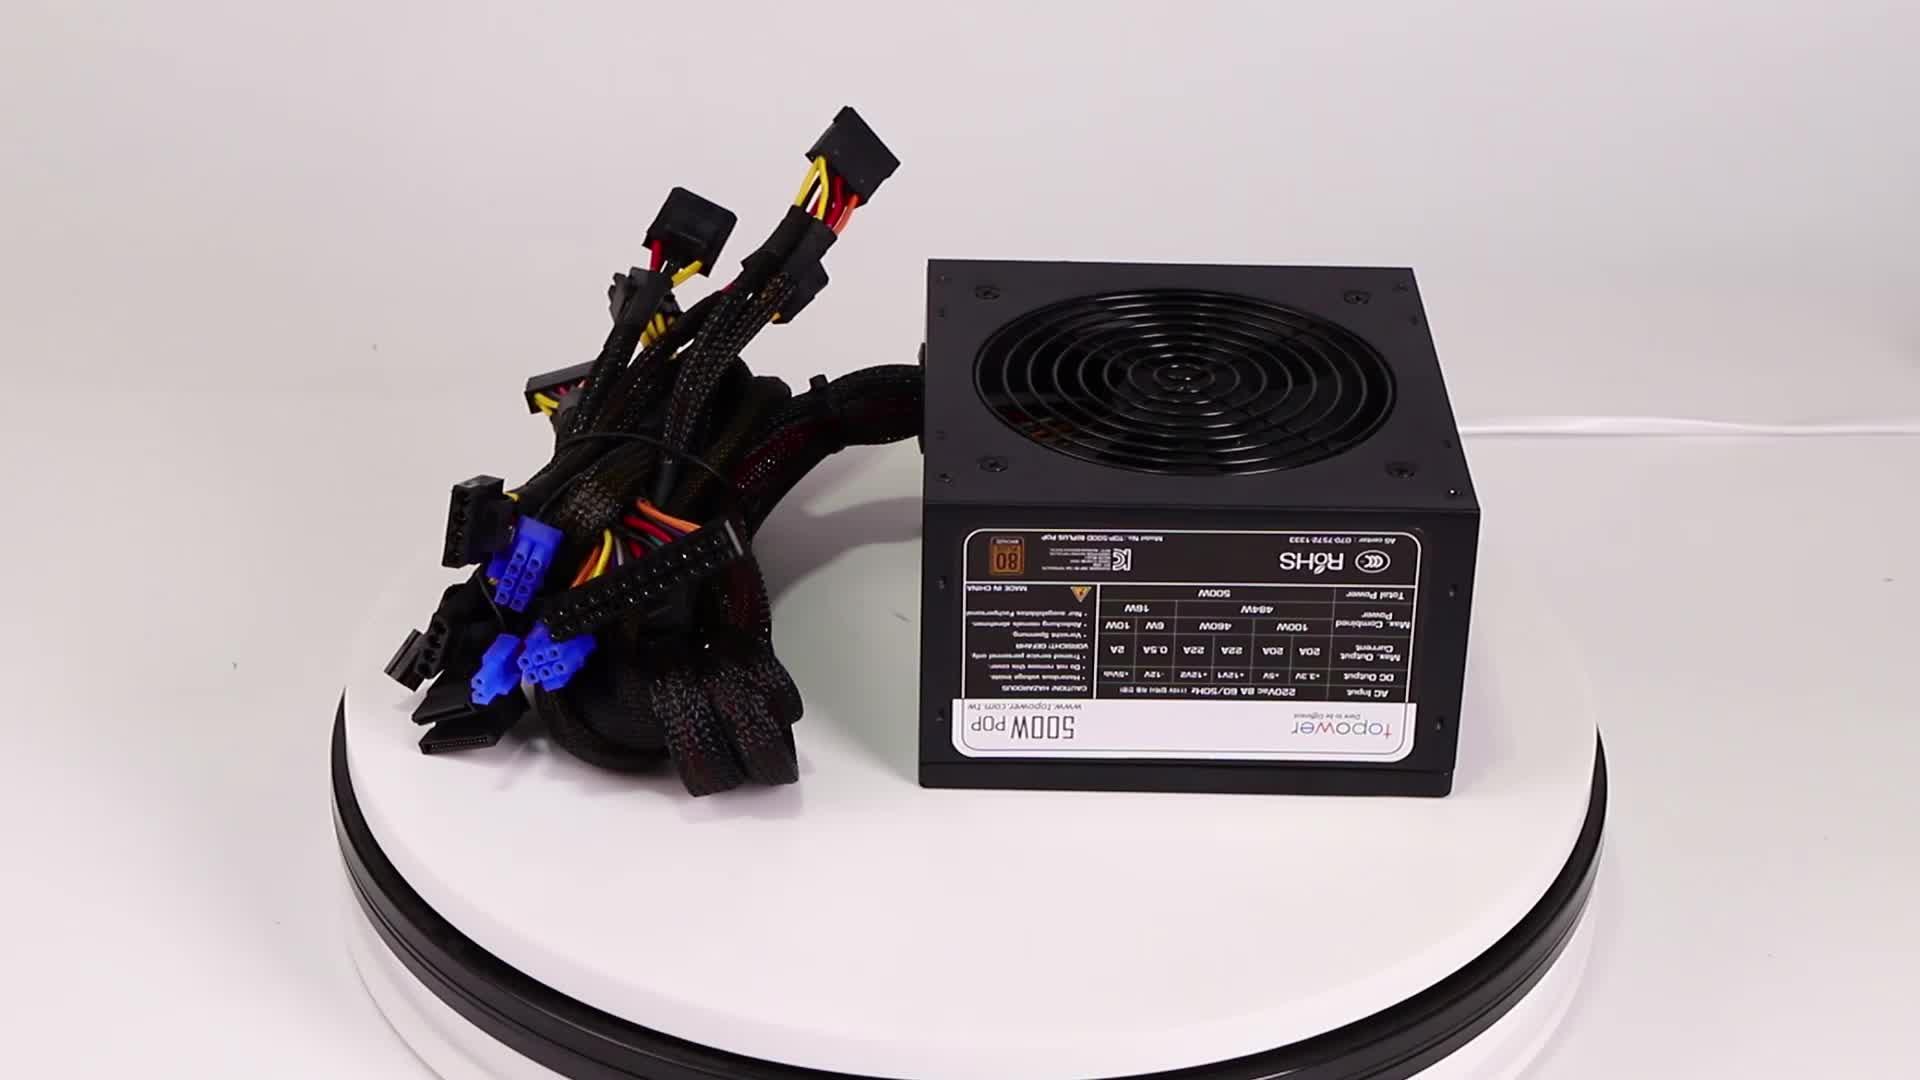 2020 güç kaynağı 12V ile 24Pin 400W 500W 600W 700W PSU Pc için kılıf oyun